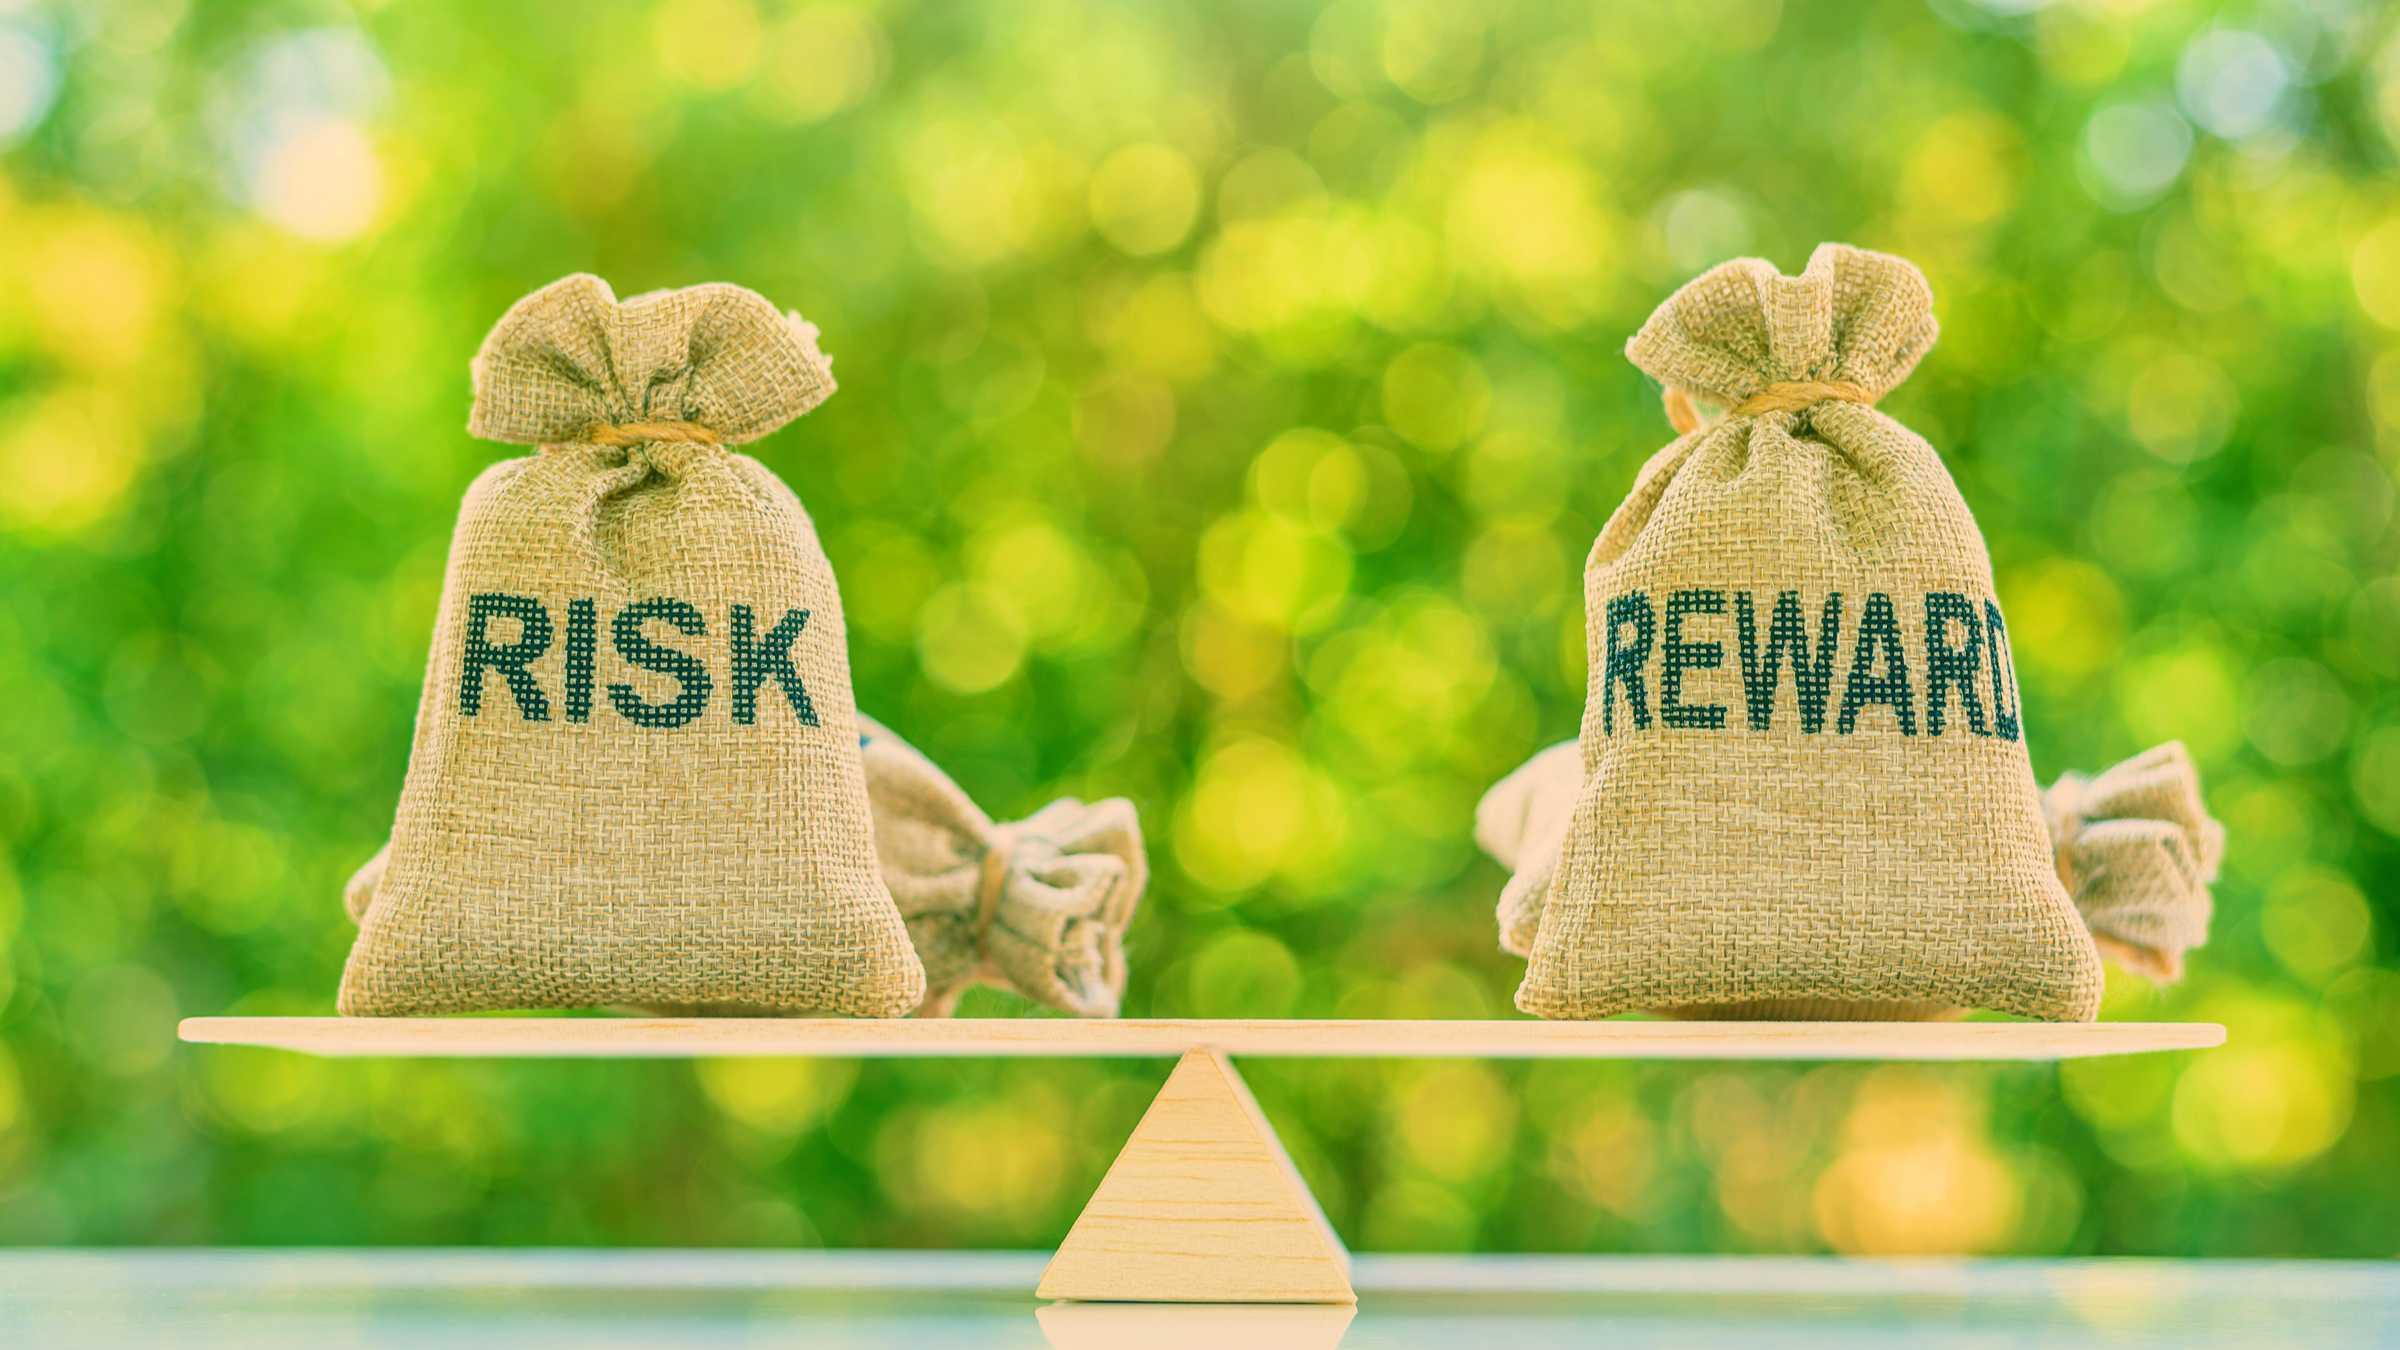 Rendite und Risiko